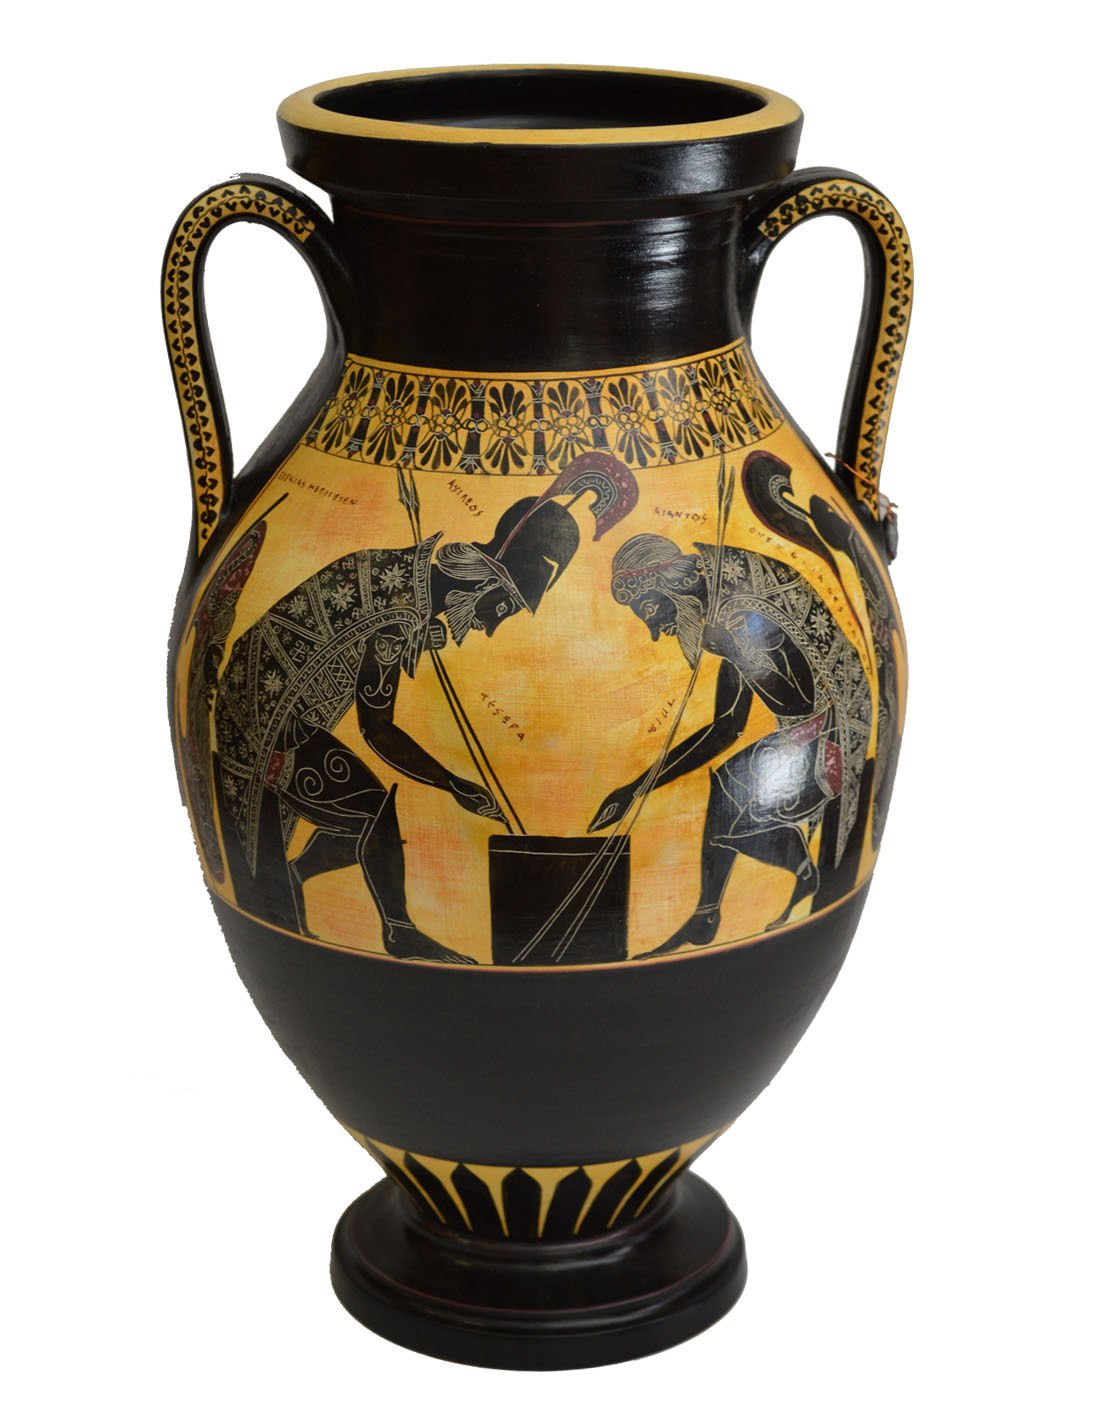 Amazon achilles and ajax exekias ancient greek amphora amazon achilles and ajax exekias ancient greek amphora vase vatican museum replica home kitchen floridaeventfo Gallery